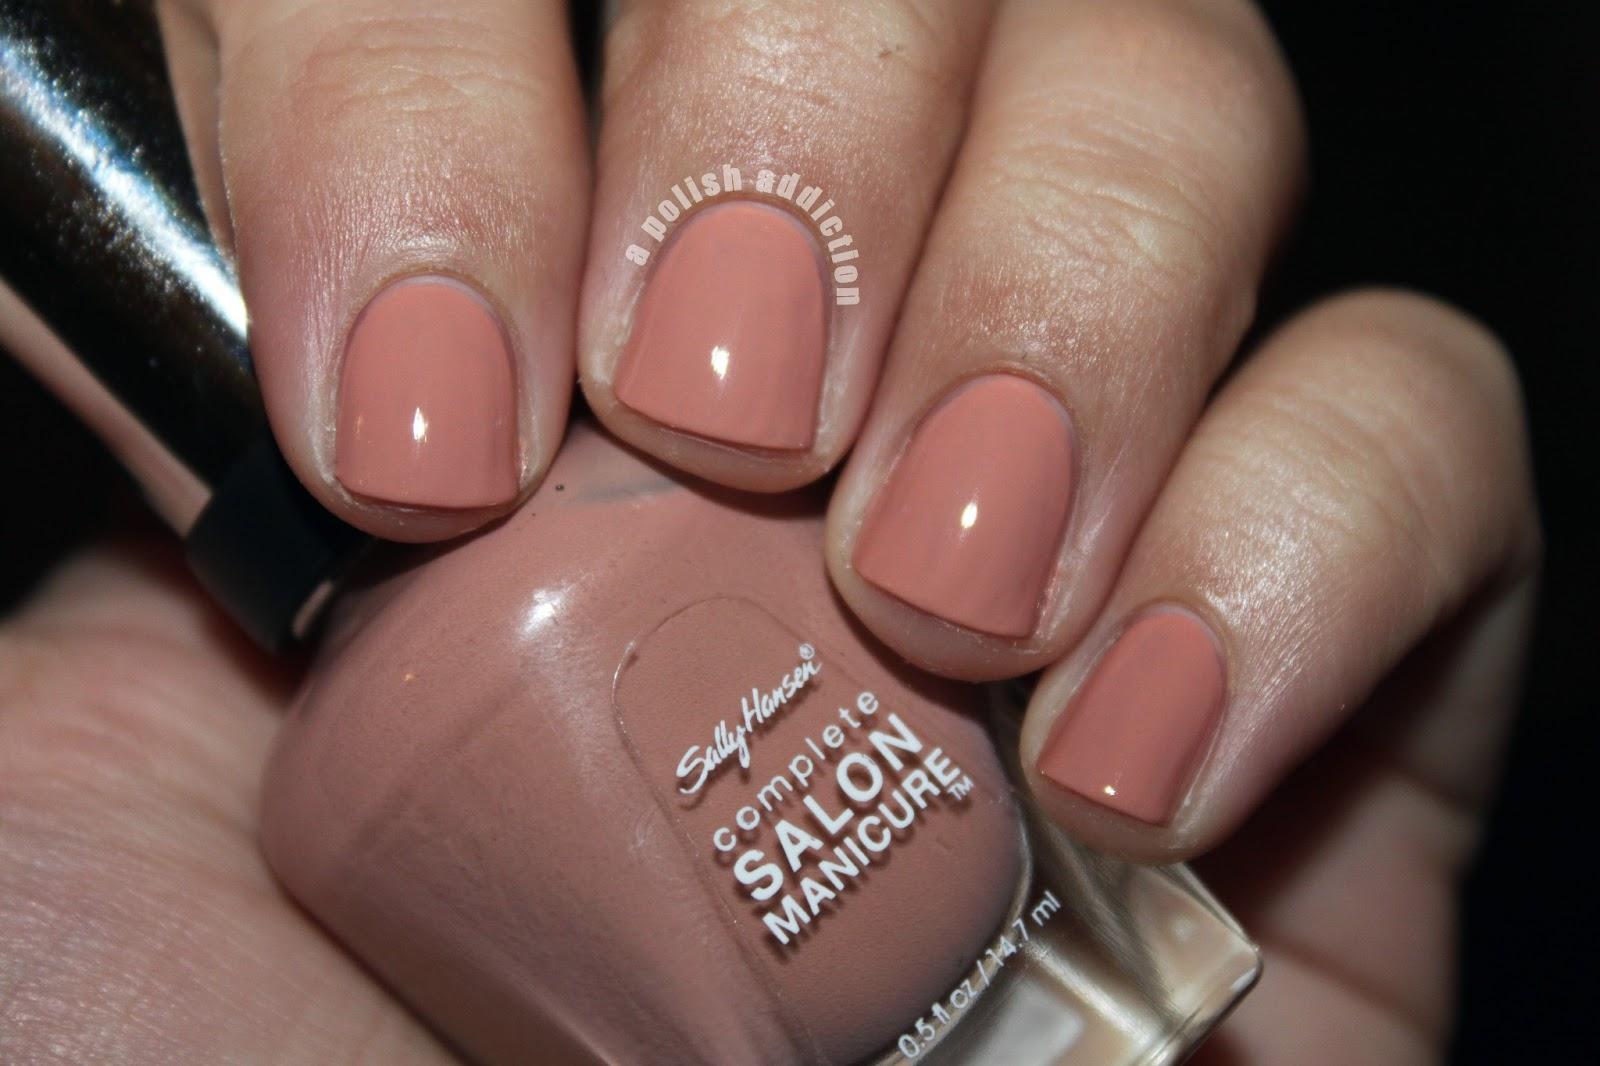 A polish addiction sally hansen complete salon manicure for Salon manicure